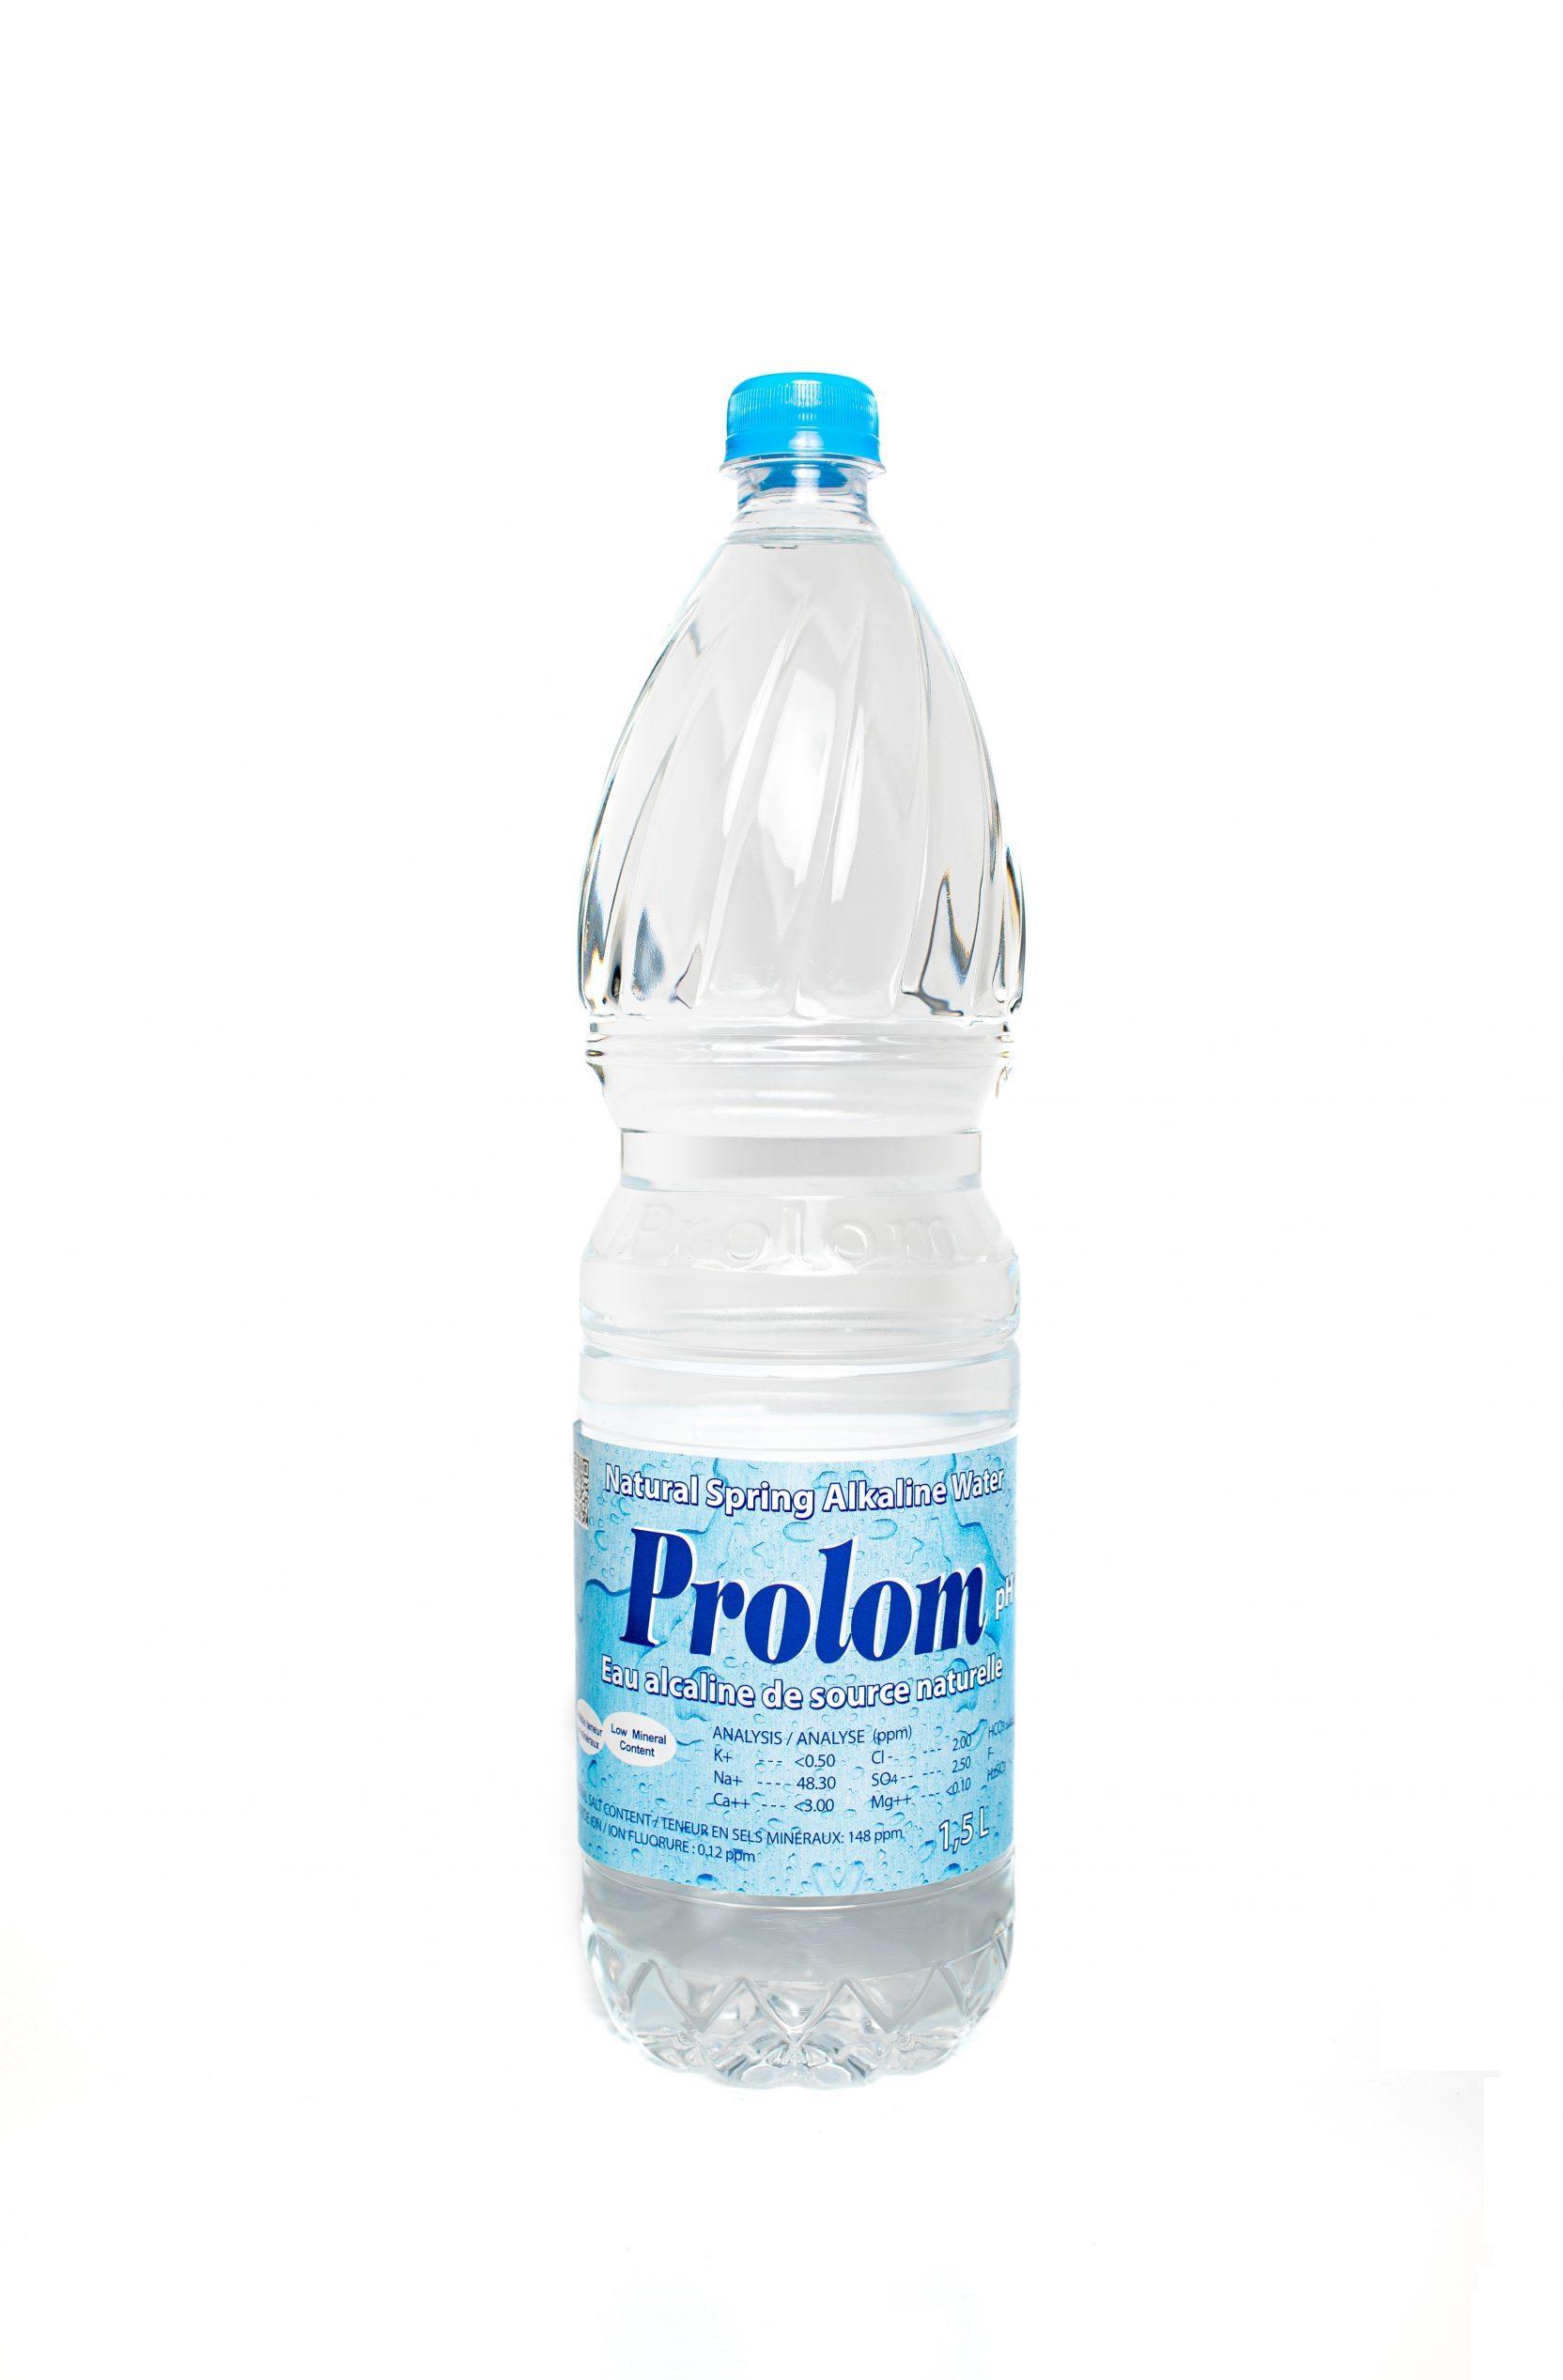 Prolom water – 1.5L | 6 pack